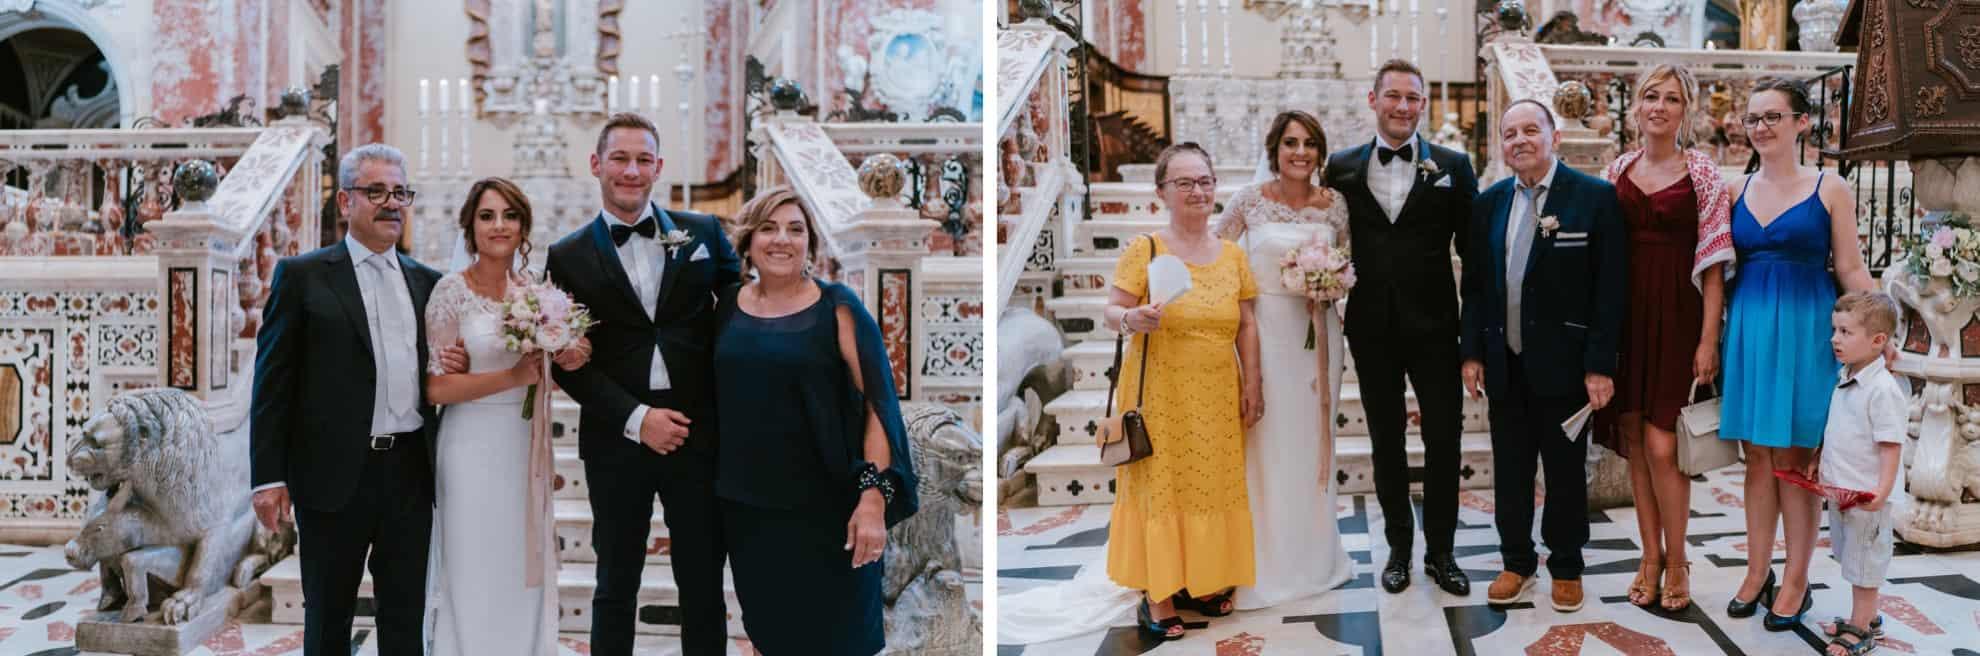 42_Giulia e Wojciech-0541_Giulia e Wojciech-0545